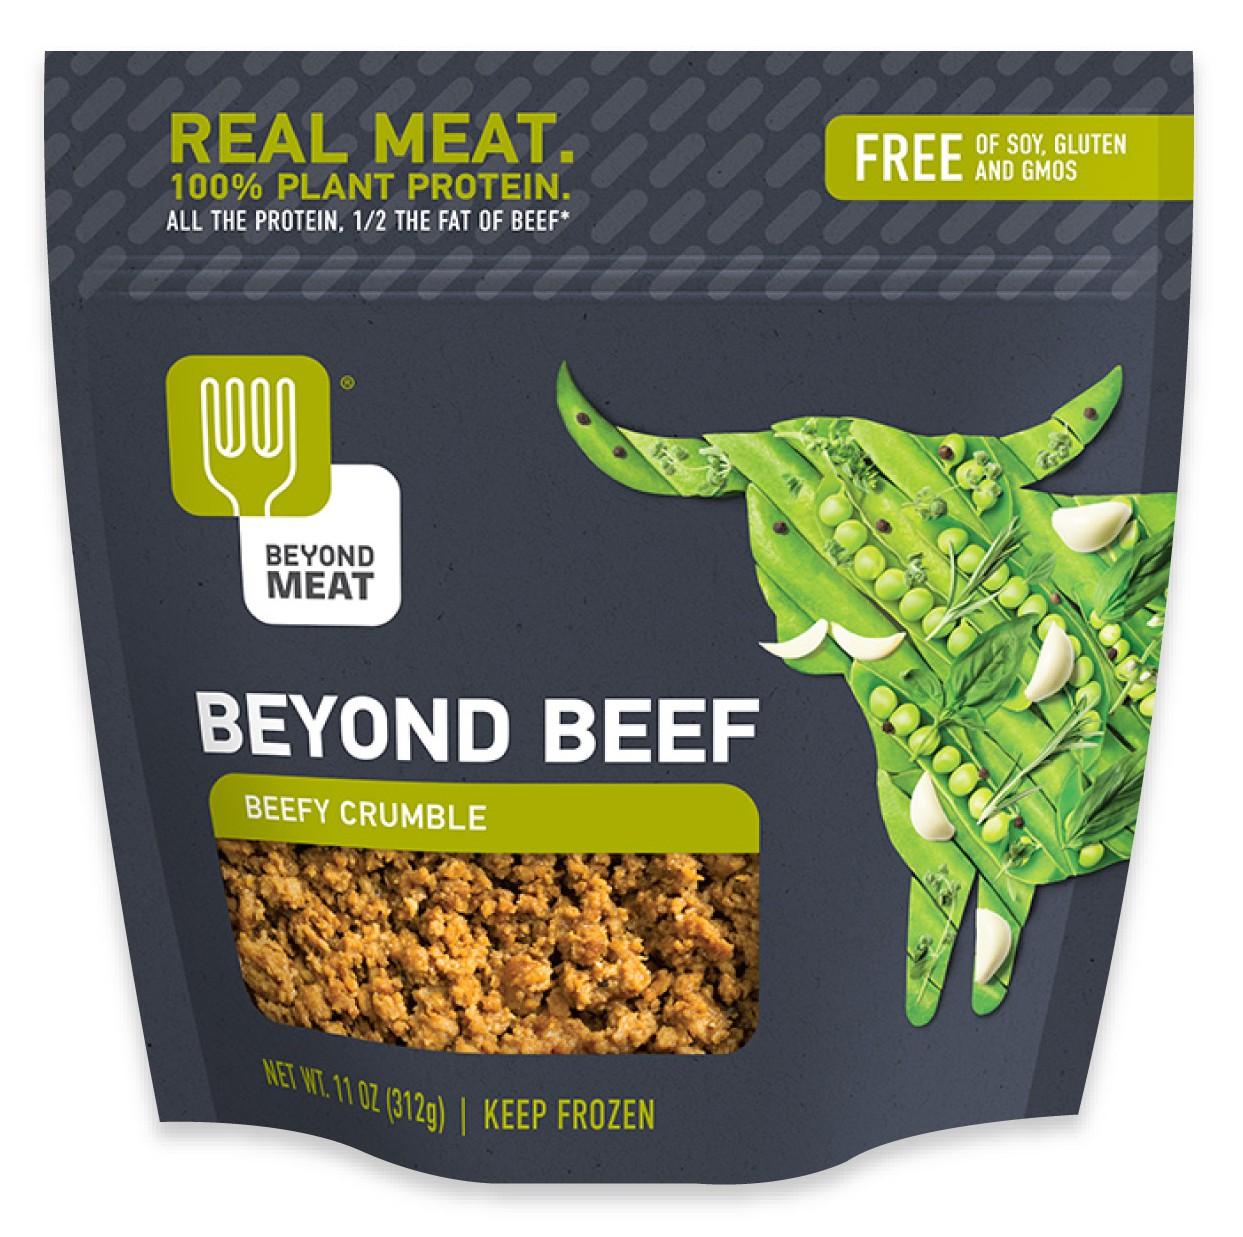 Vegan Ground Beef: Beyond Meat Vegan Beef With Ginger And Onion Dumplings